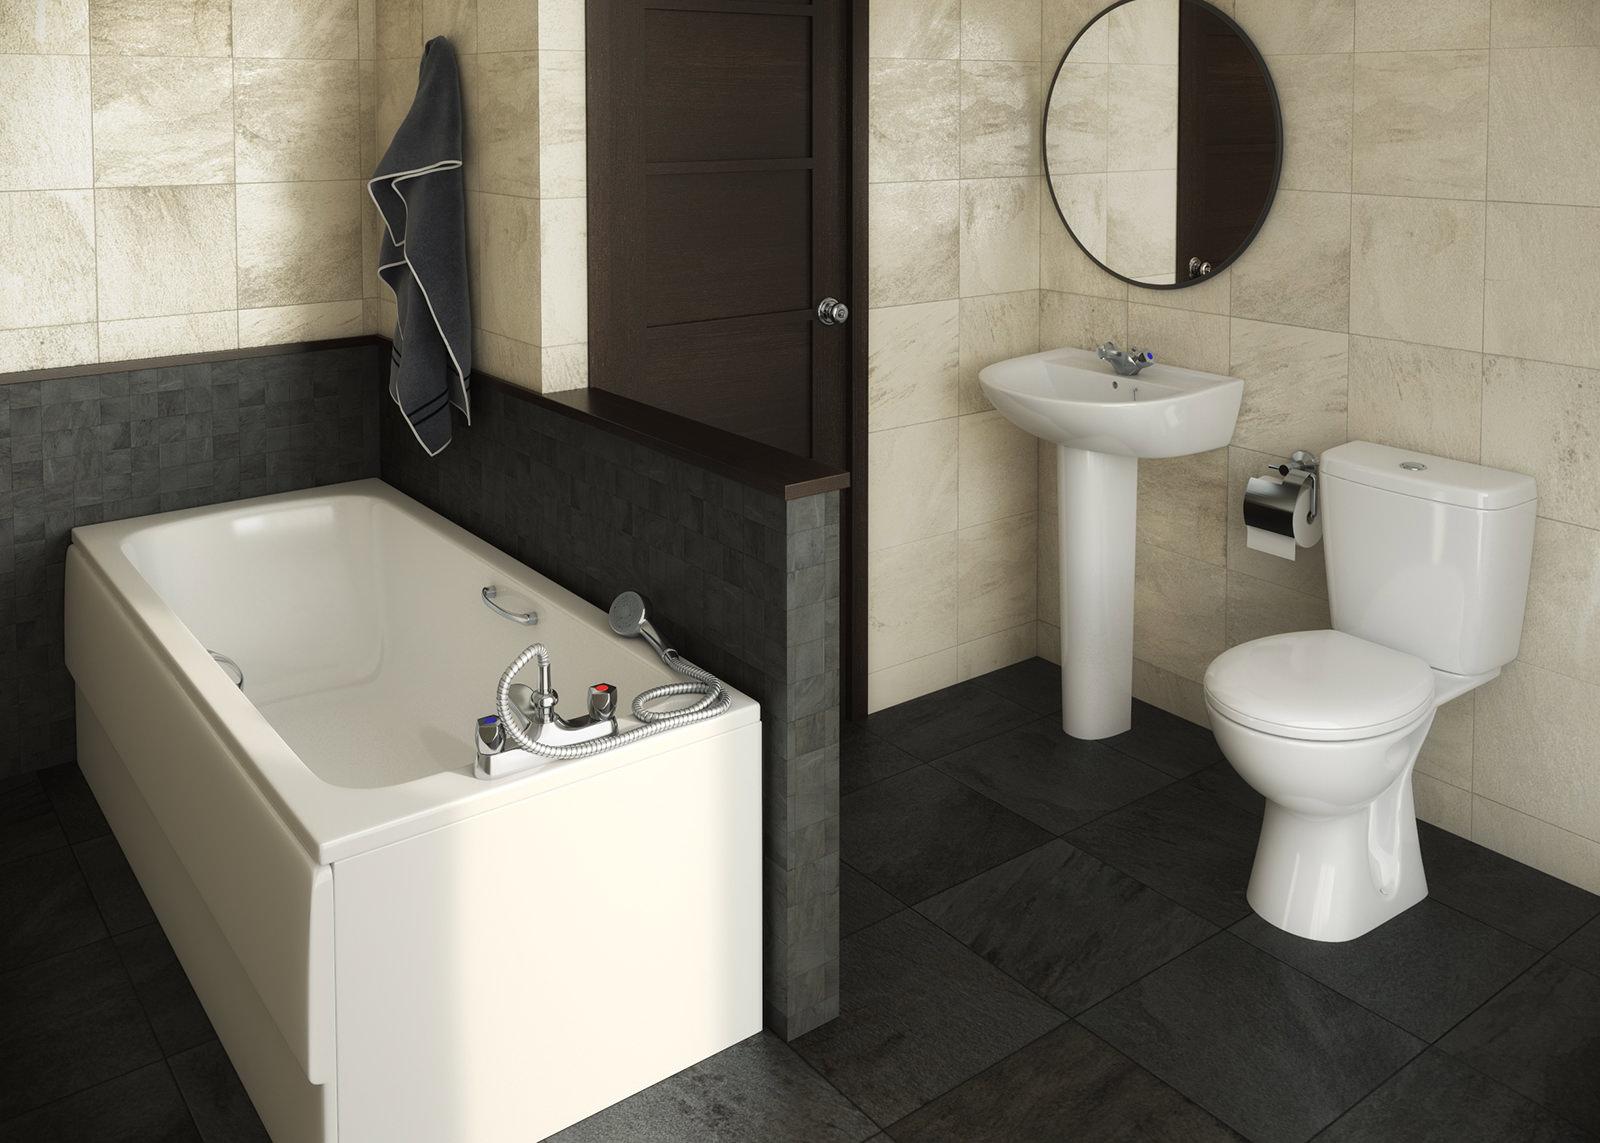 Armitage shanks bathroom sinks - Armitage Shanks Sandringham 21 1th White Bathroom To Go Pack